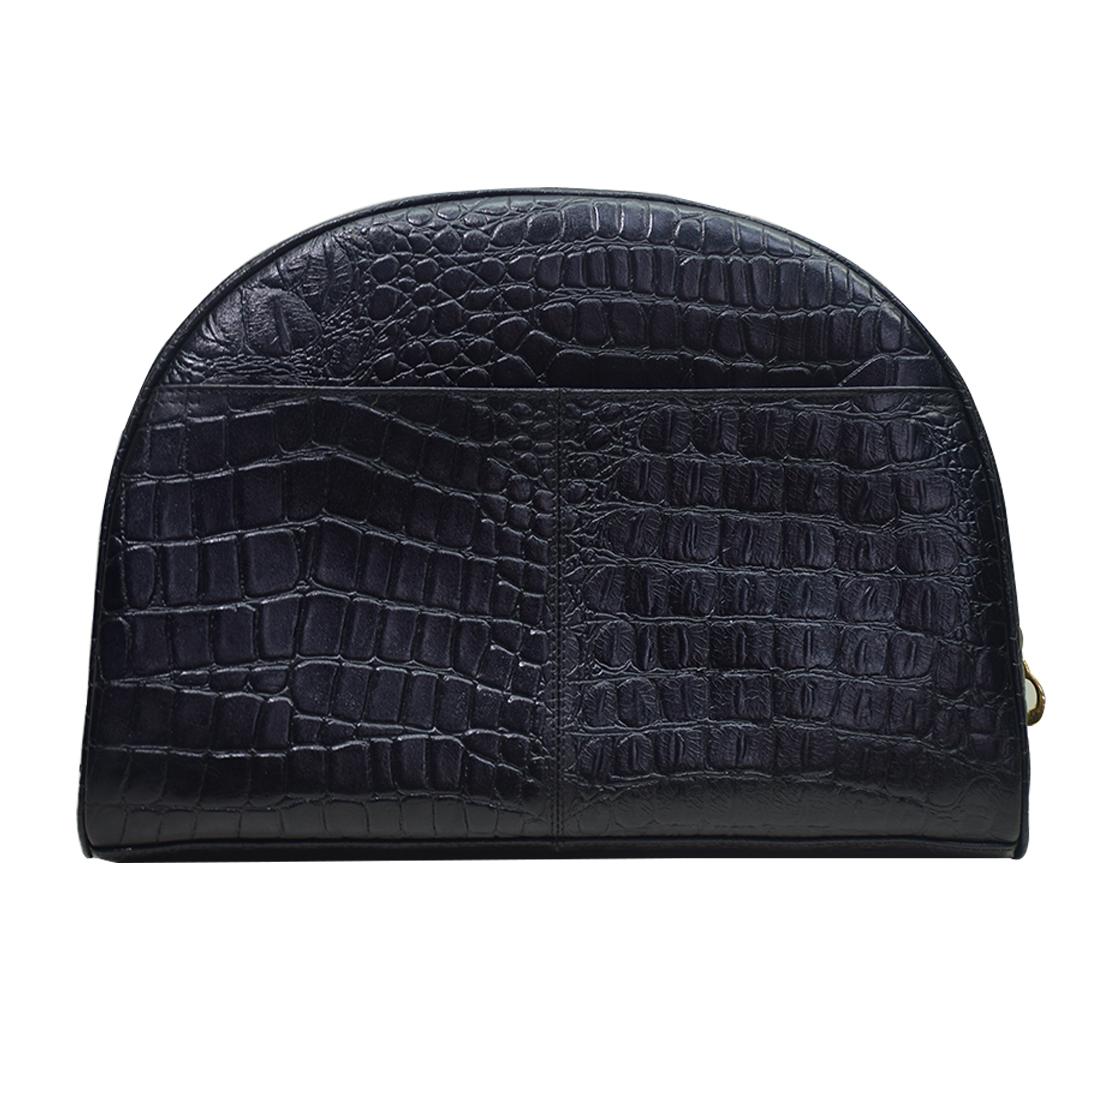 Croco Printed Designer Leather Clutch Bag